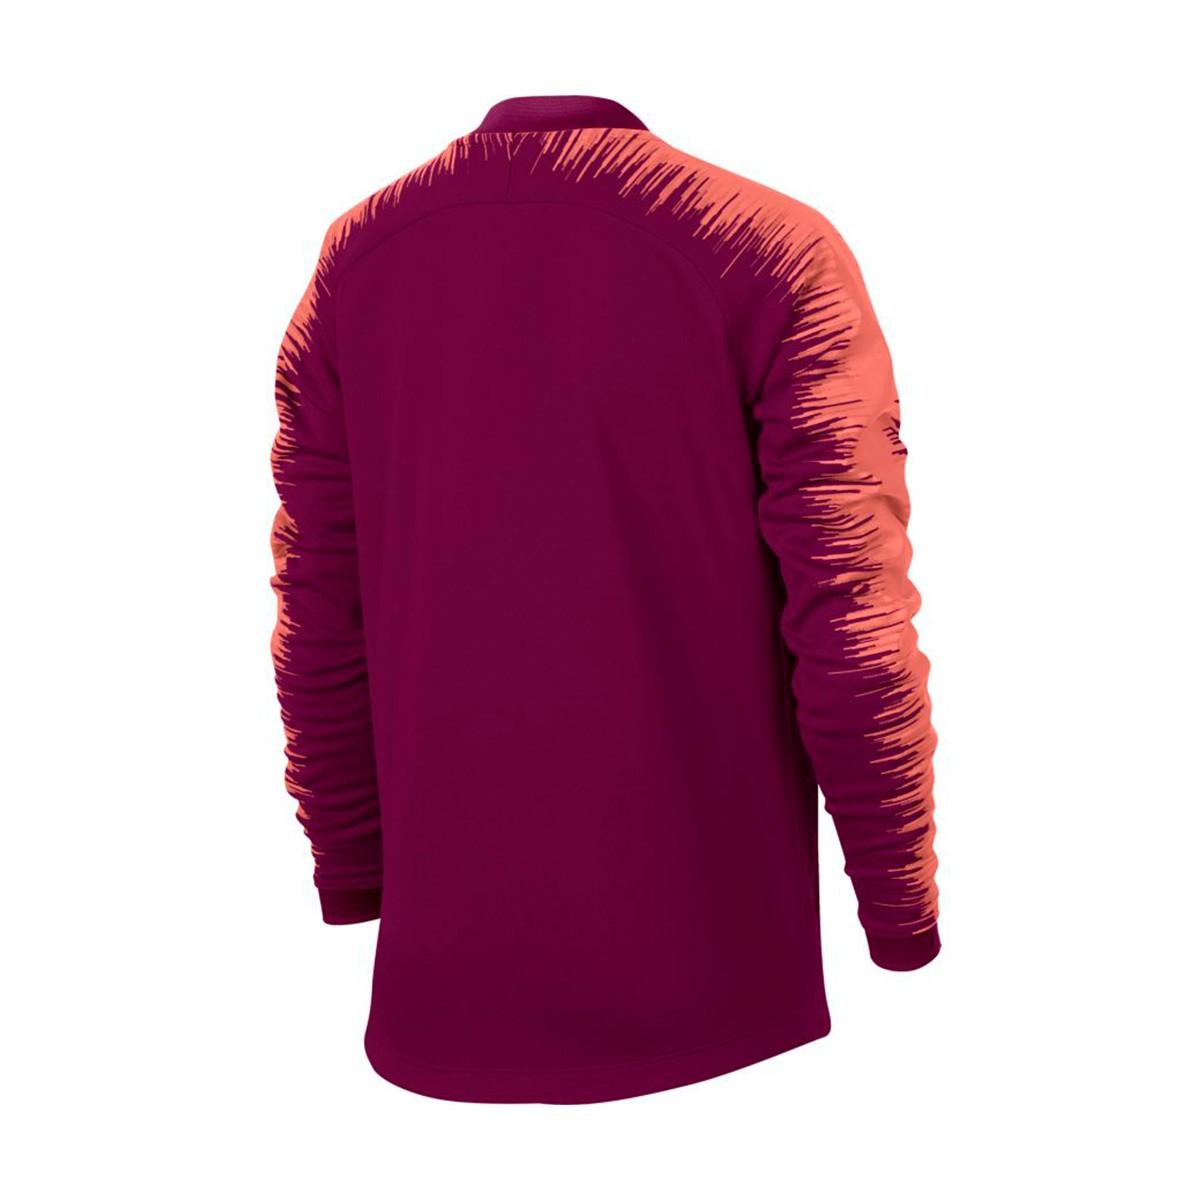 e22bfee5907c3 Chaqueta Nike FC Barcelona 2018-2019 Niño Deep maroon-Light atomic pink -  Tienda de fútbol Fútbol Emotion